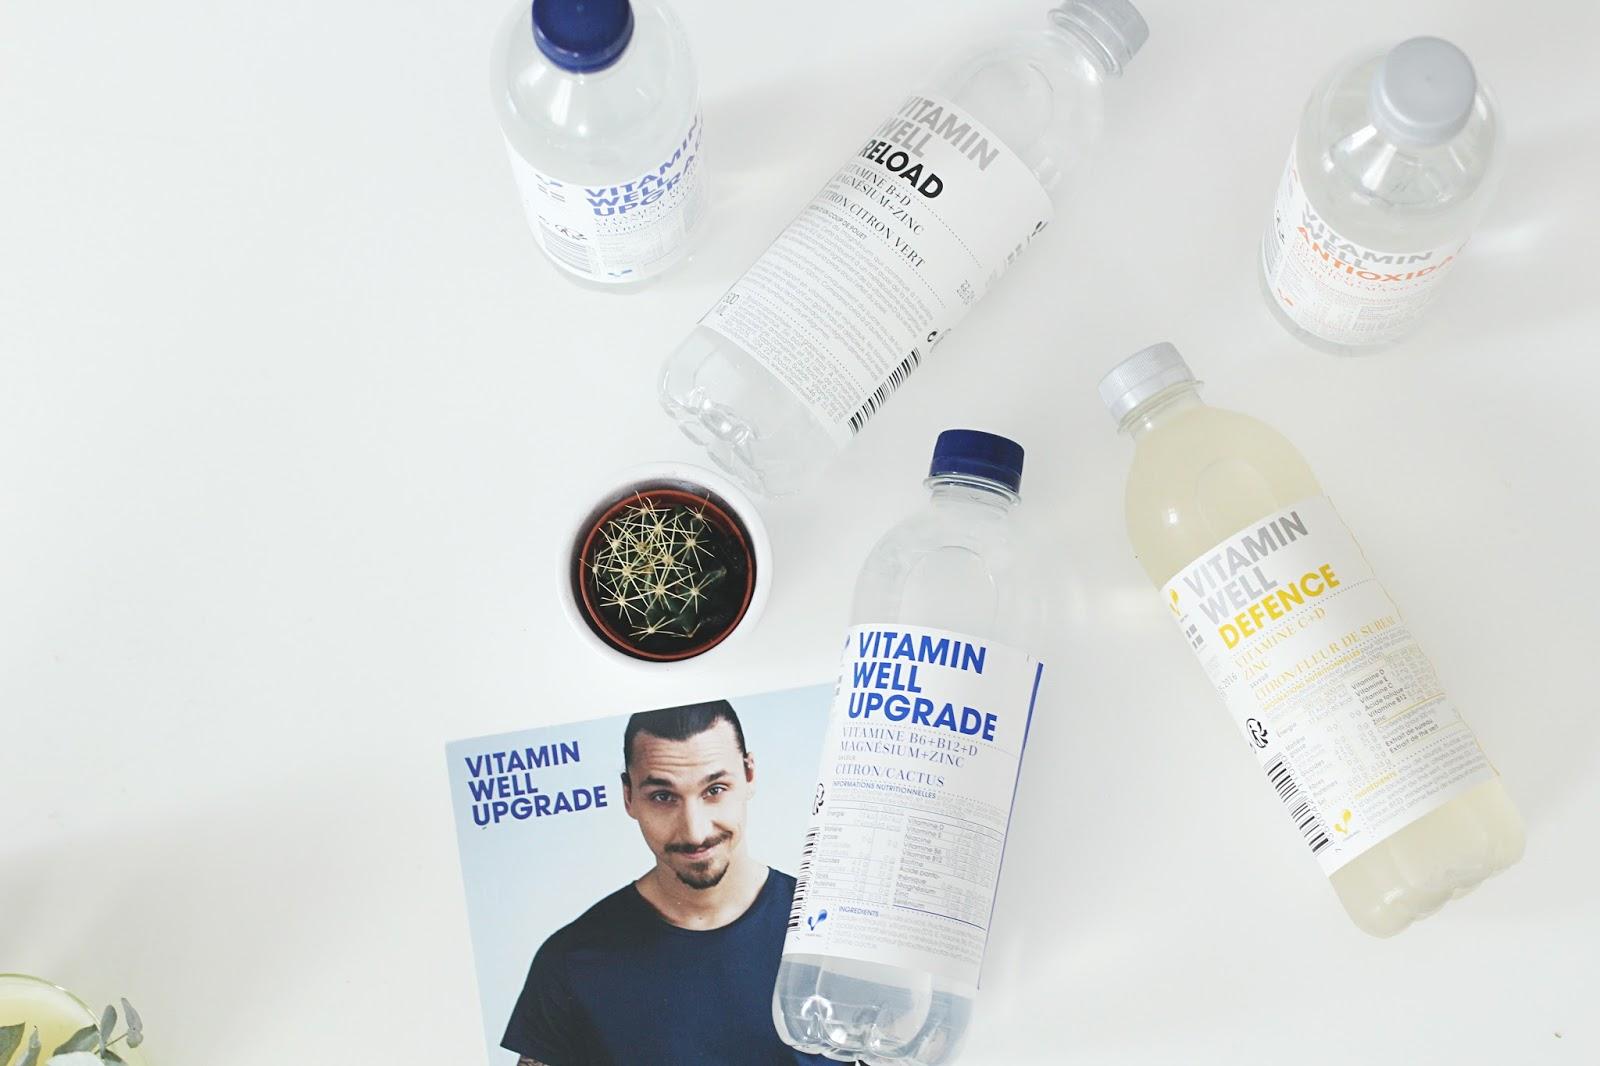 vitamin well upgrade